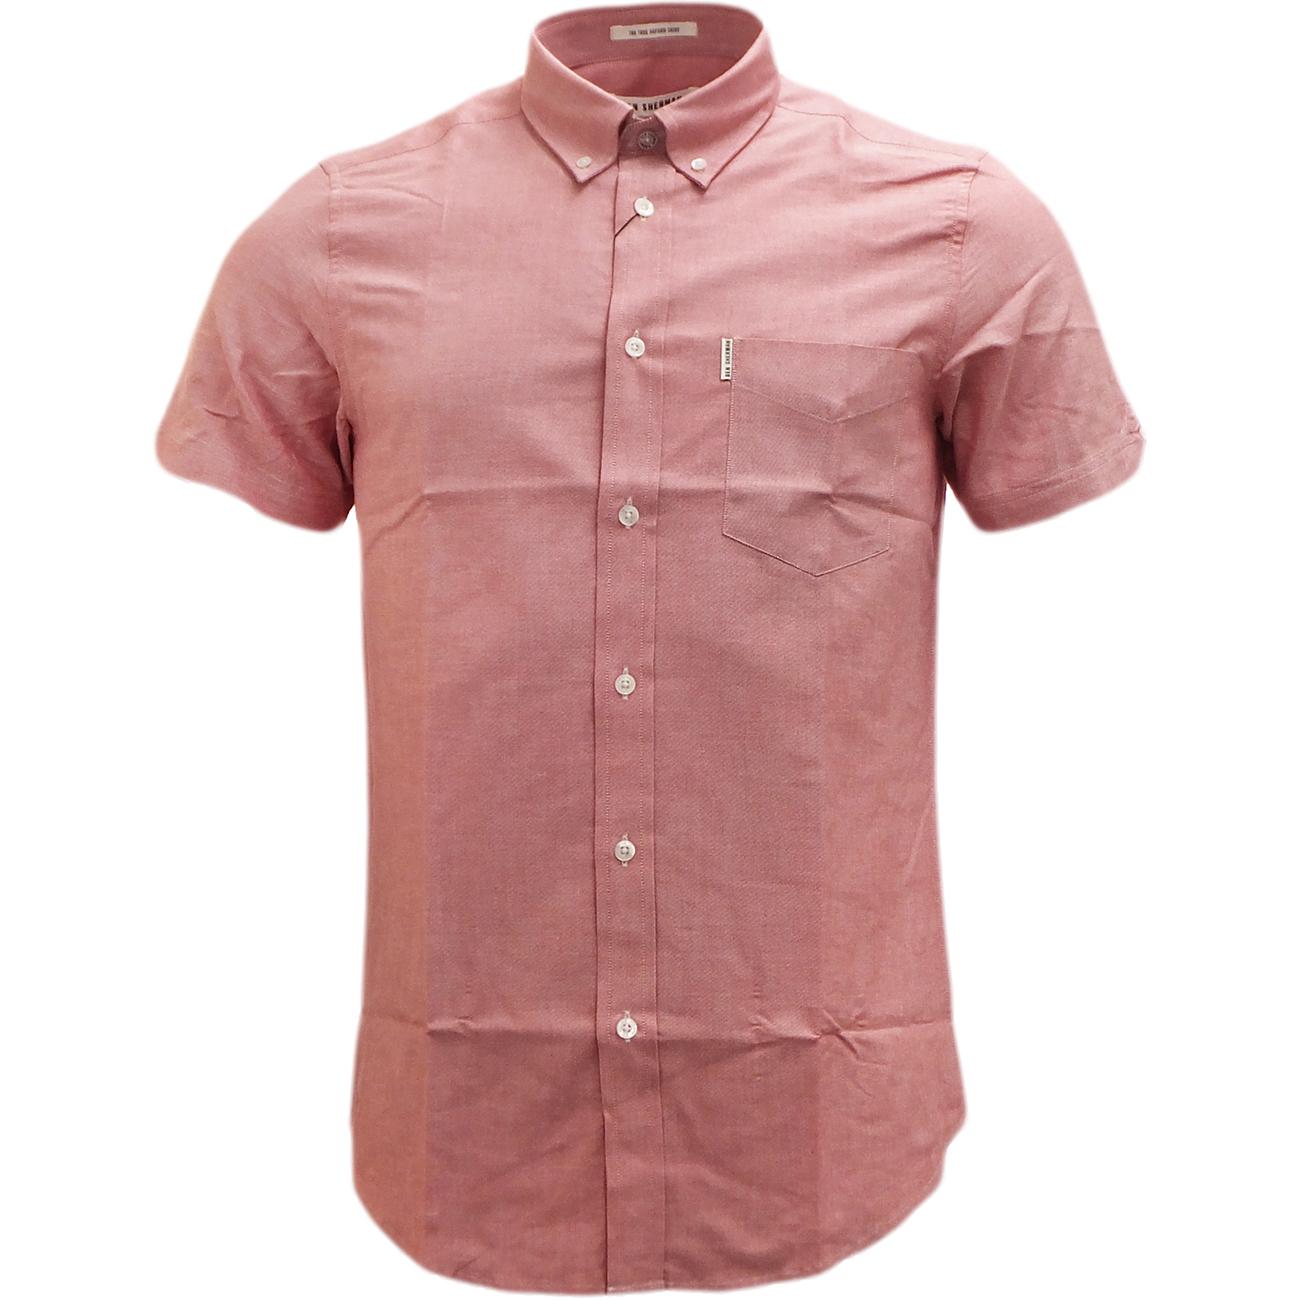 Ben Sherman Shirt Mens Shirts / Short Sleeve Shirts ...